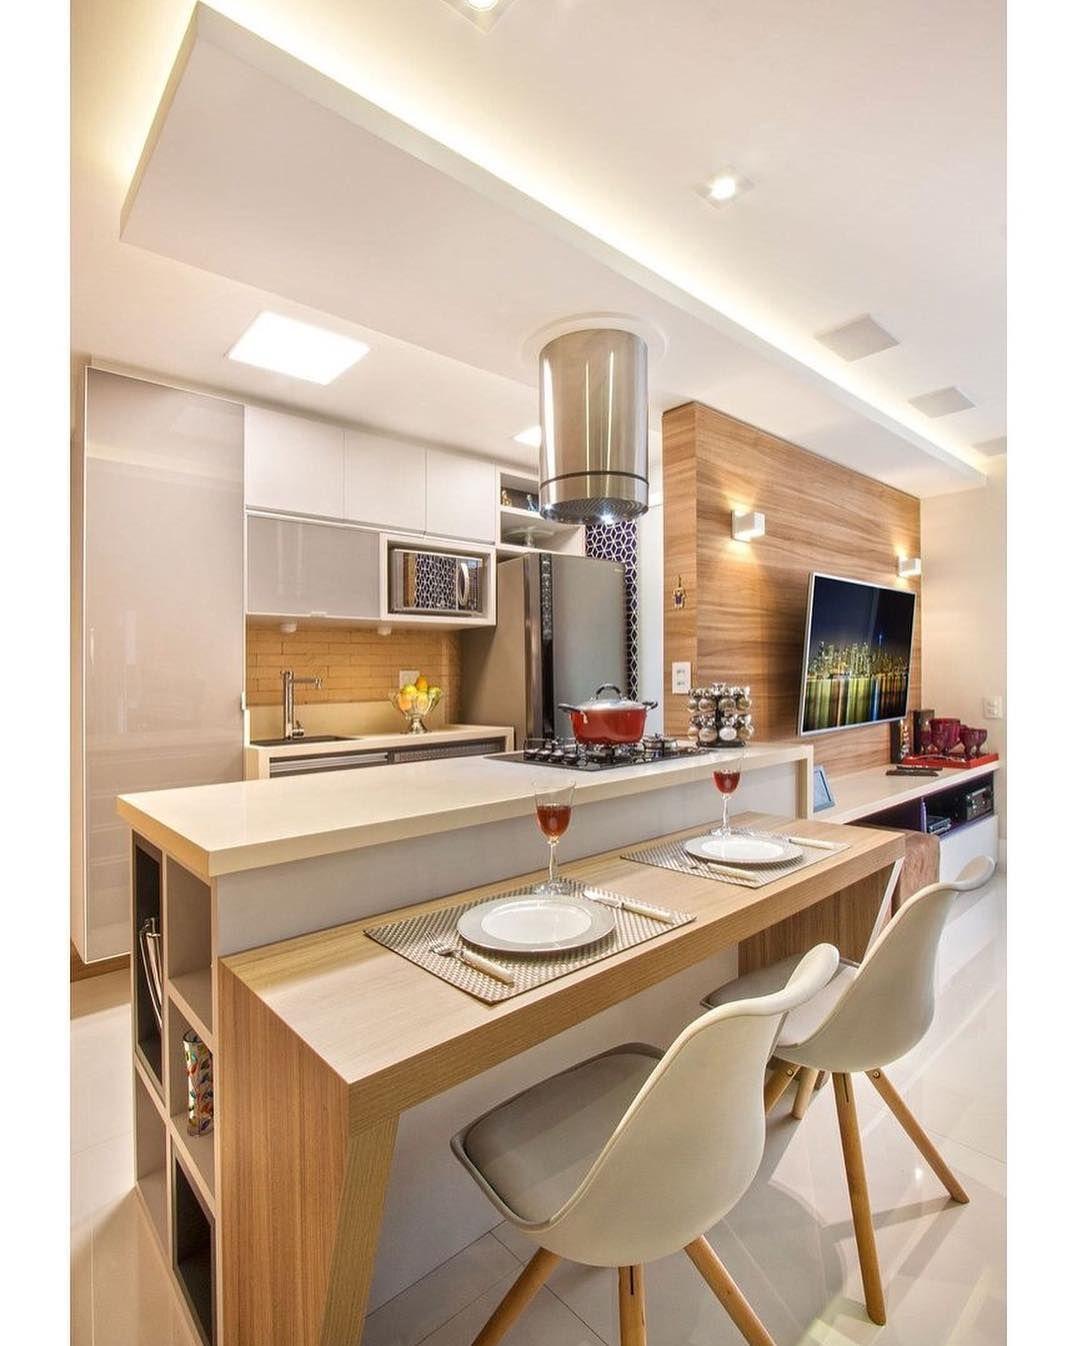 Cozinha Americana Pequena 60 Projetos Para Se Inspirar Kitchen